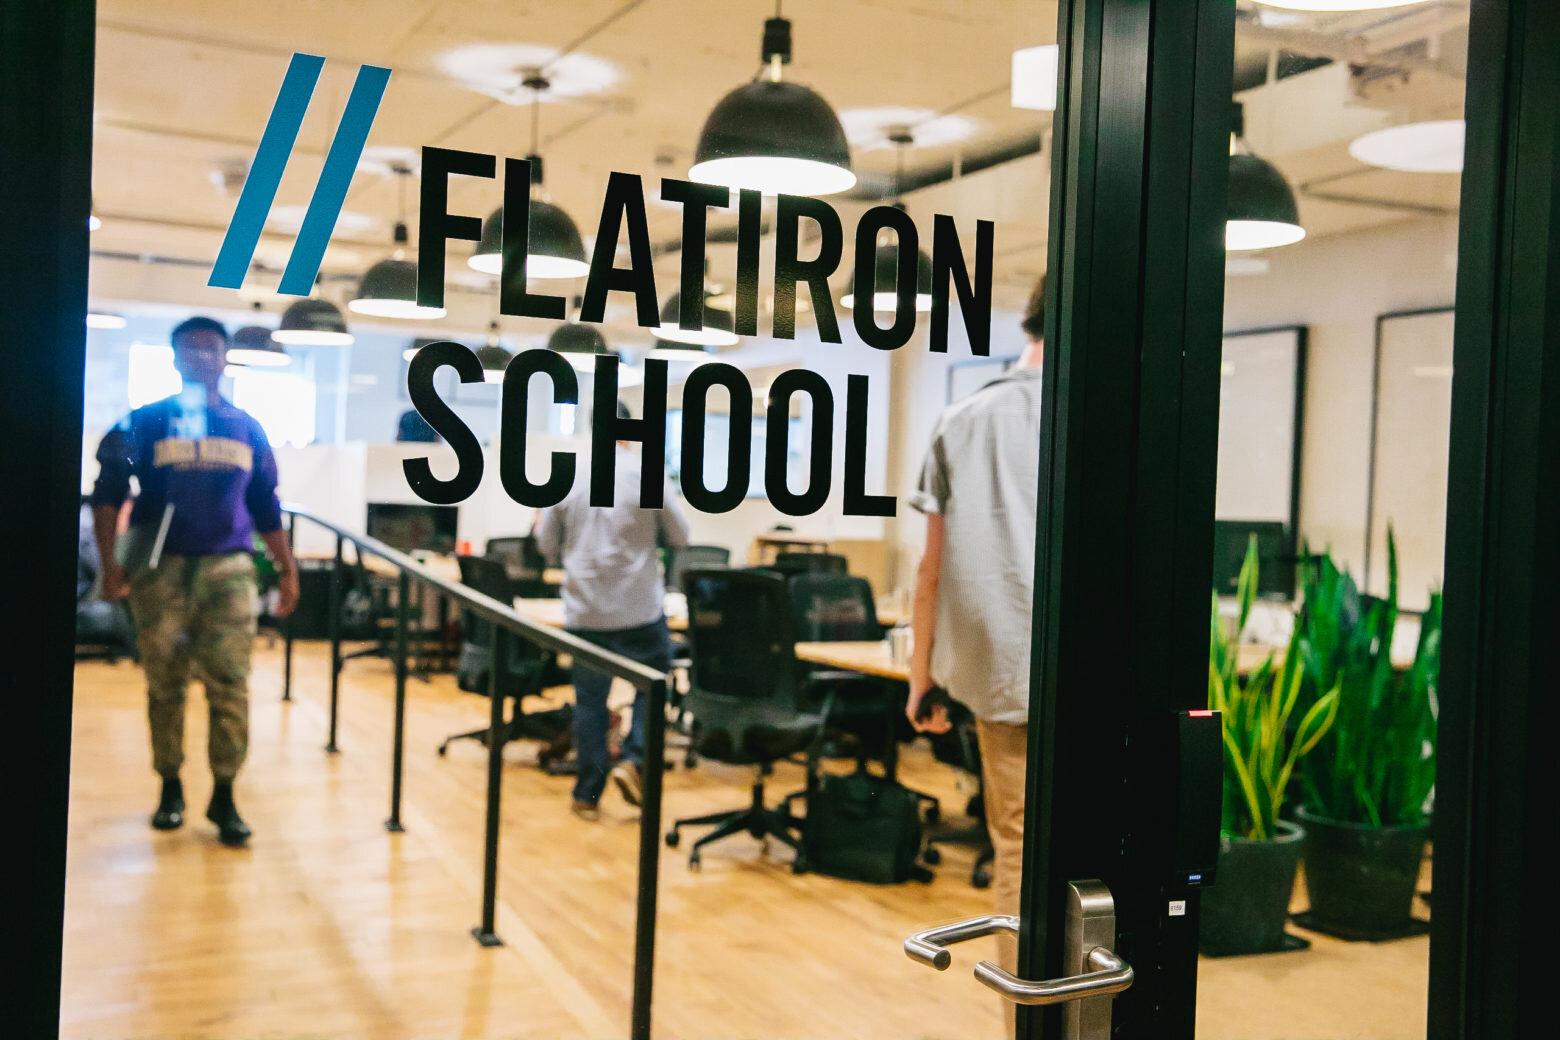 Flatiron-School-1-e1549550455622.jpg